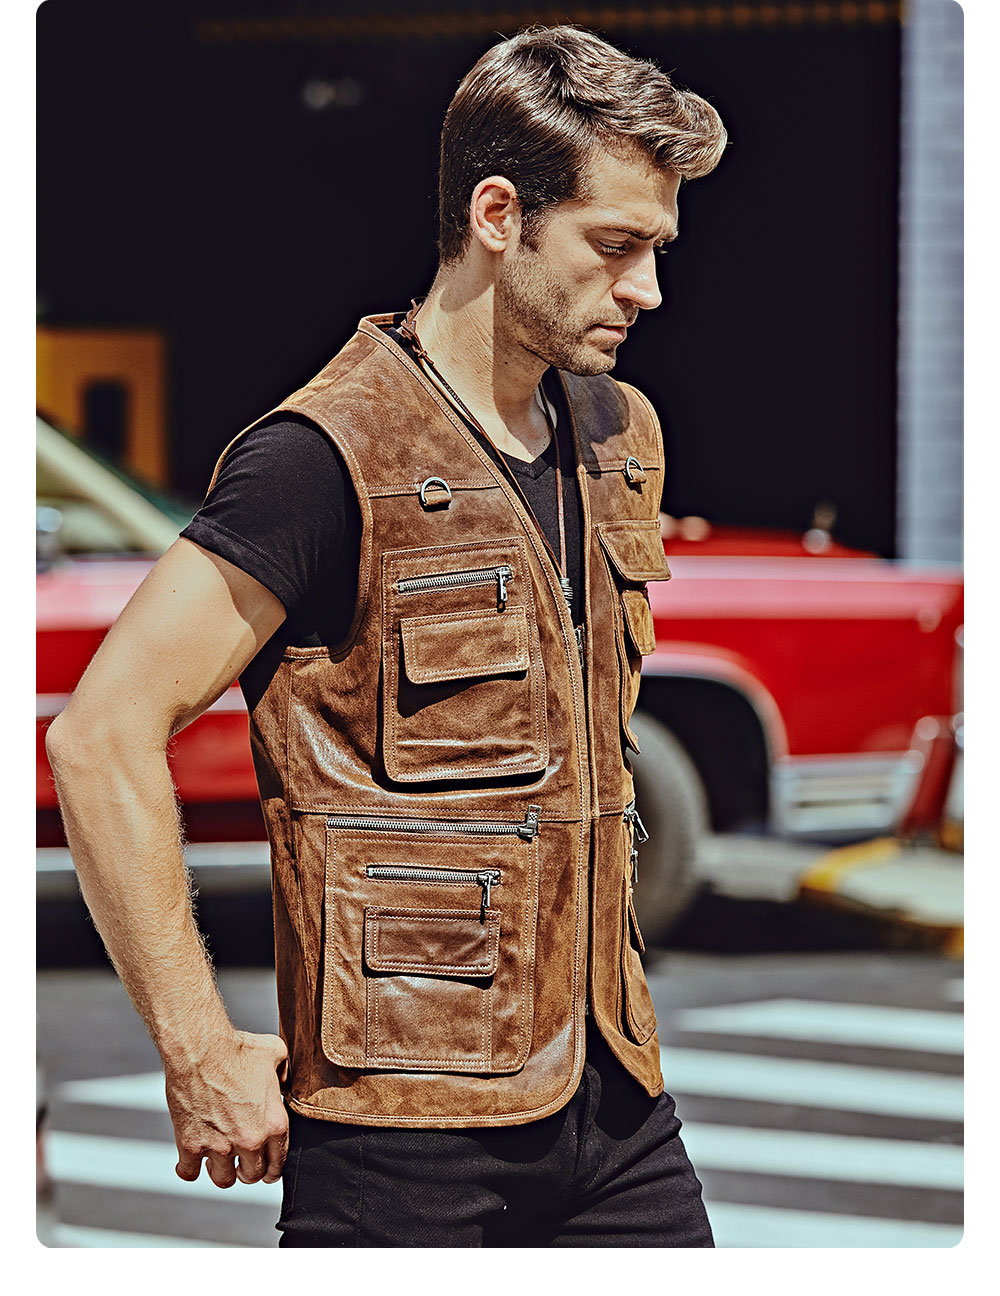 Hc2bdfd80dee1434bb2a798a62df59fd1J FLAVOR New Men's Real Leather Vest Men's Motorcycle Fishing Outdoor Travel Vests